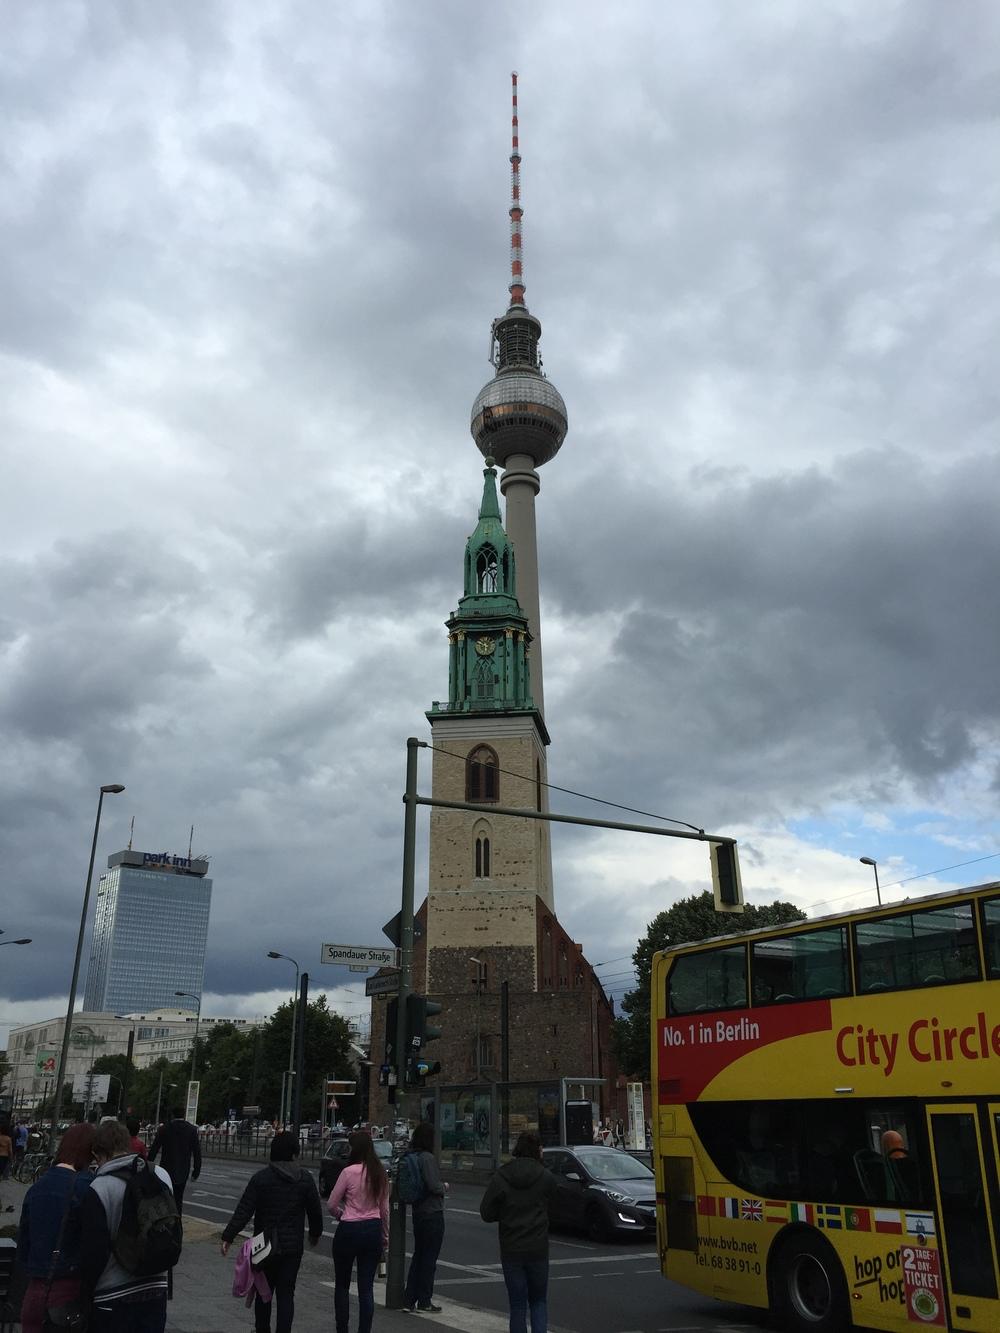 Fernsehturm Berlin-TV tower in Alexanderplatz